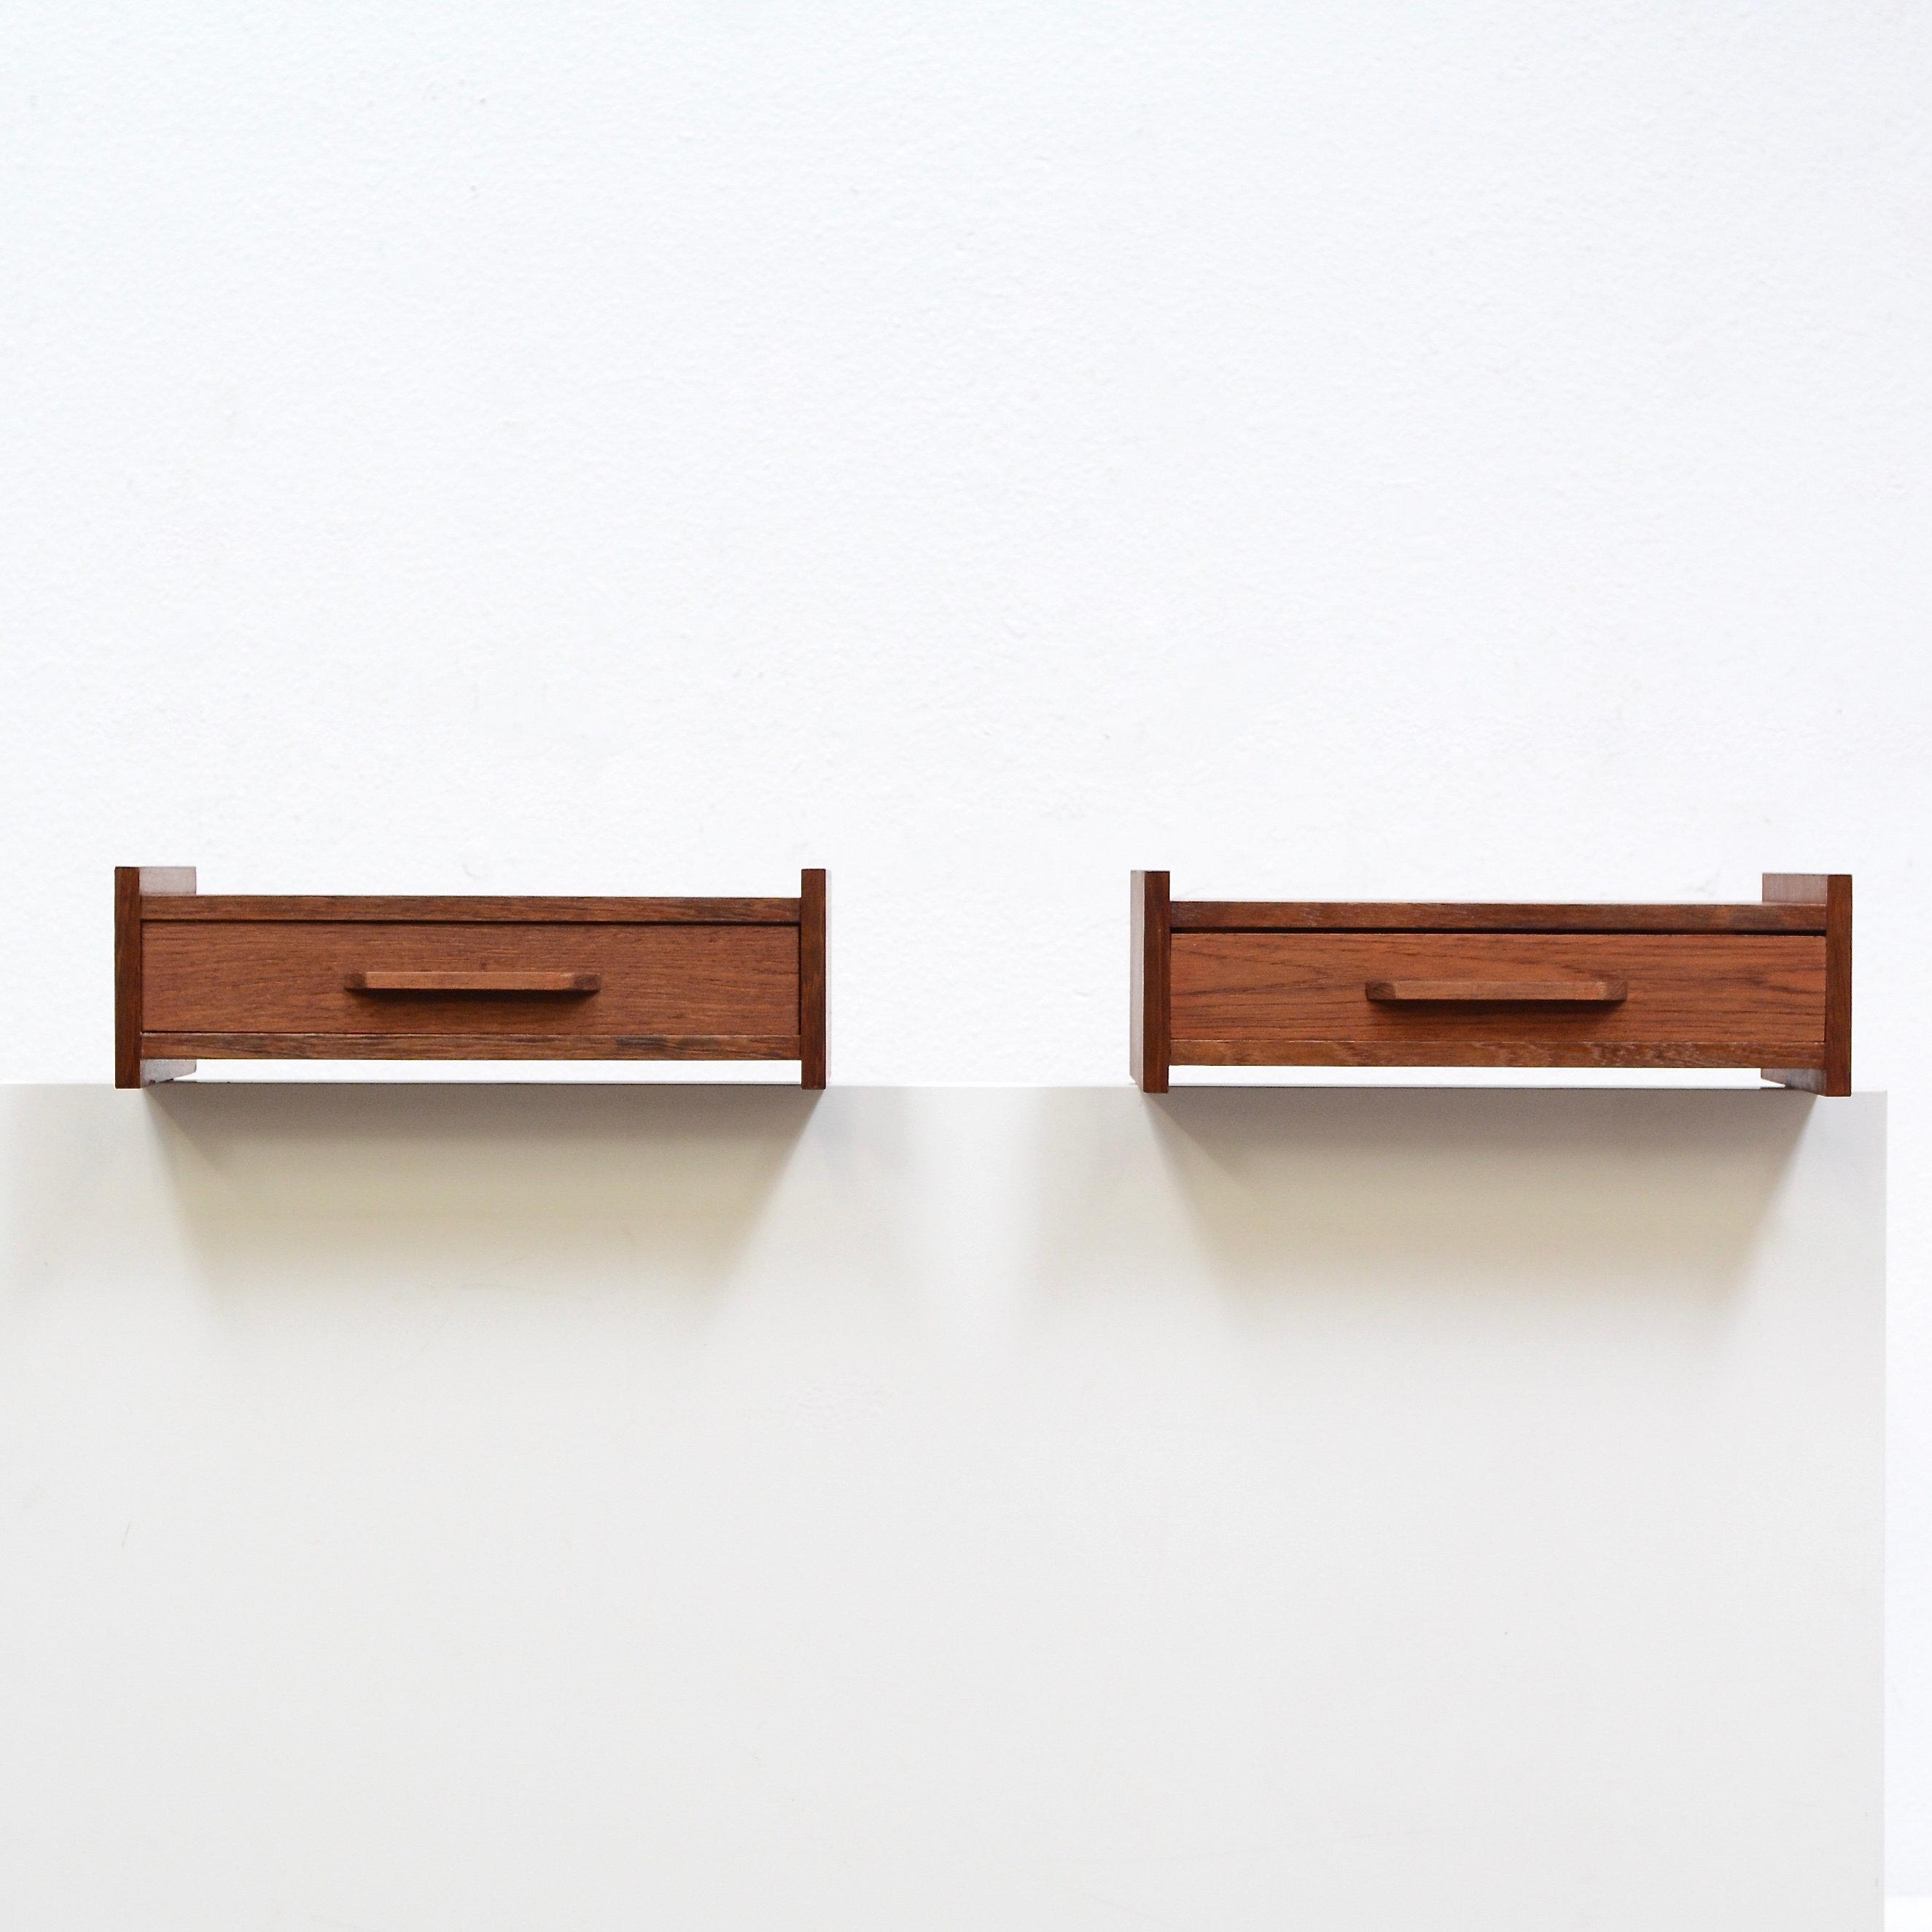 A Pair Danish Modern Teak Floating Nightstand Shelf Tables